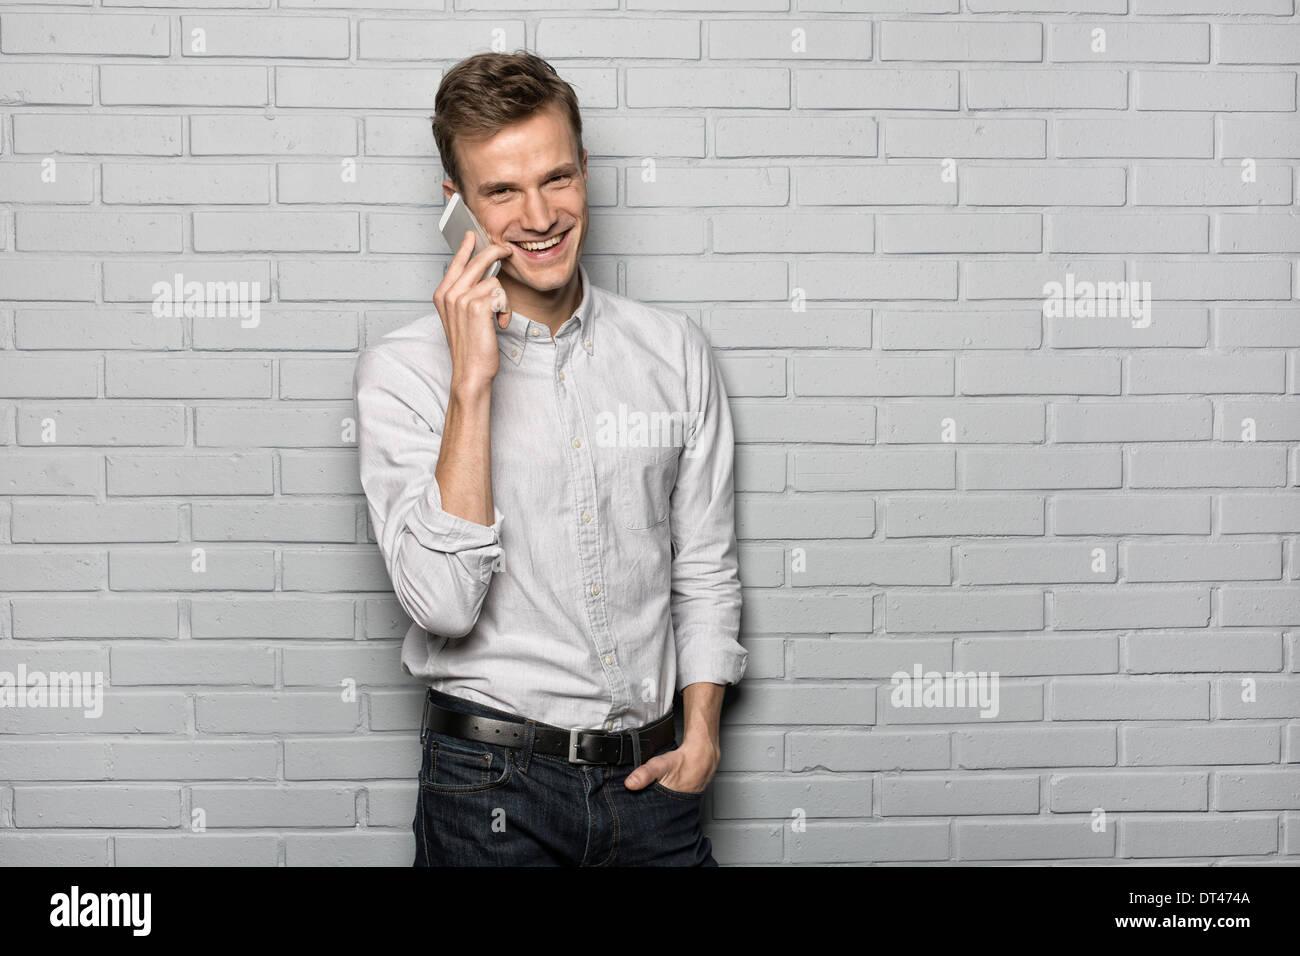 Male portrait smiling Mobile Phone studio brick looking camera - Stock Image